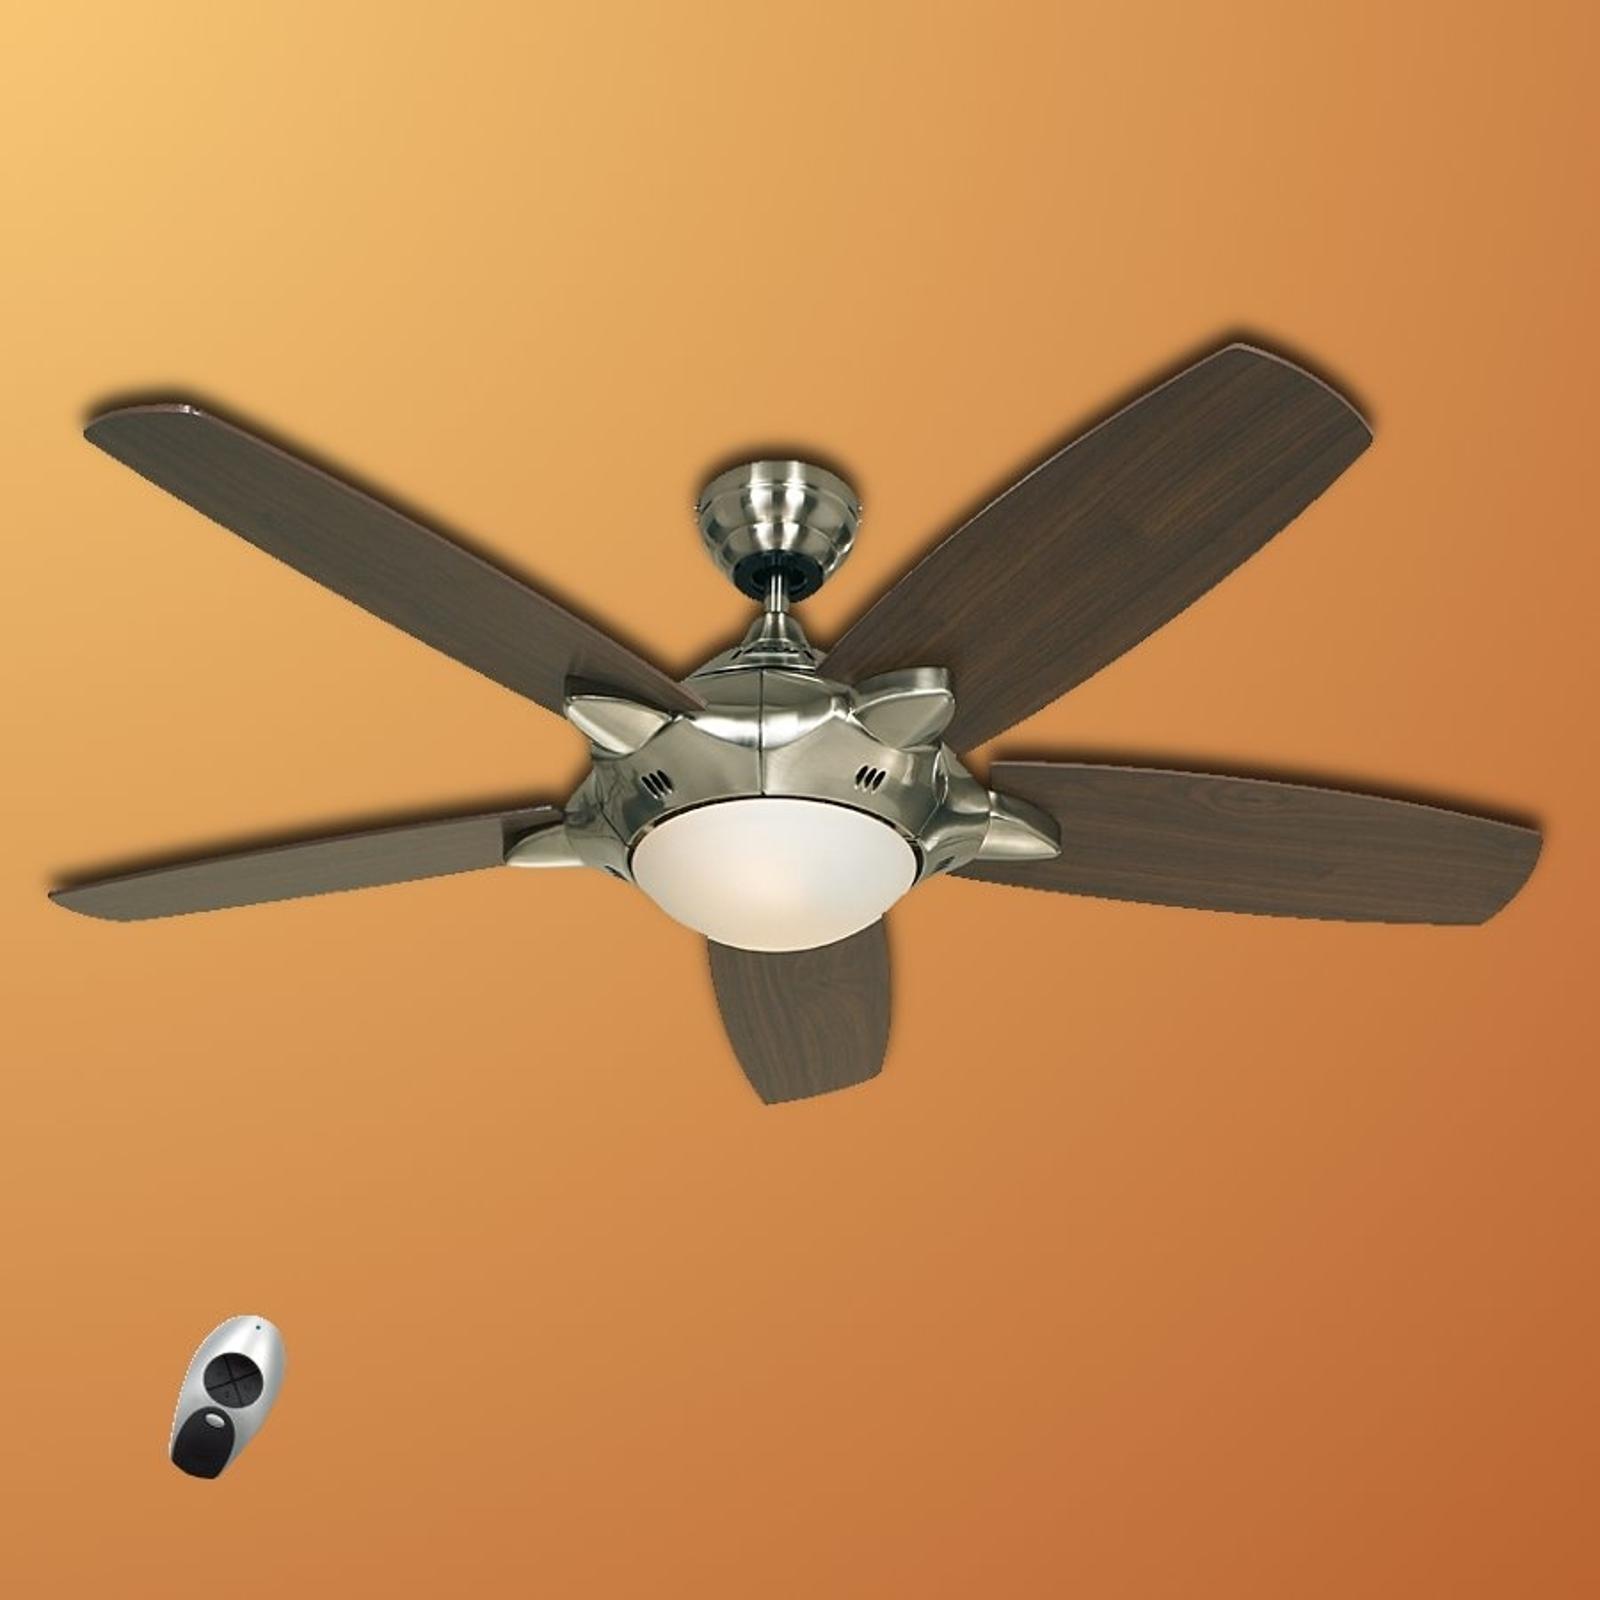 Ventilateur de plafond lumineux Mercury